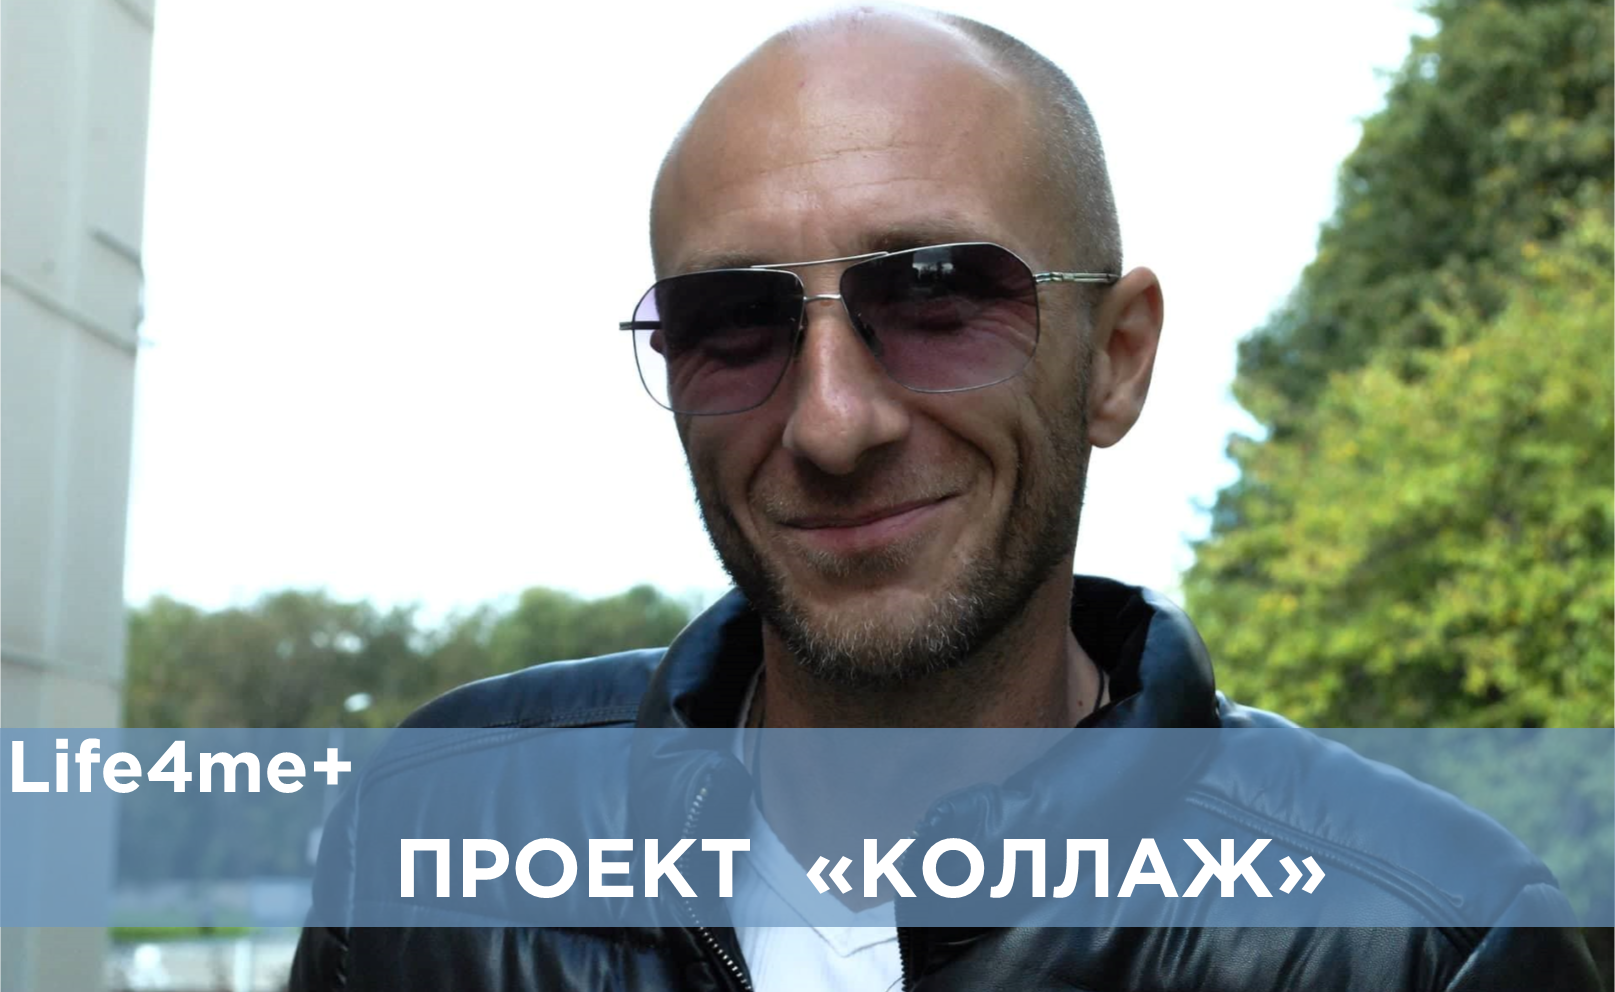 «Коллаж»: Петр Головин, г. Берёзовский, Россия